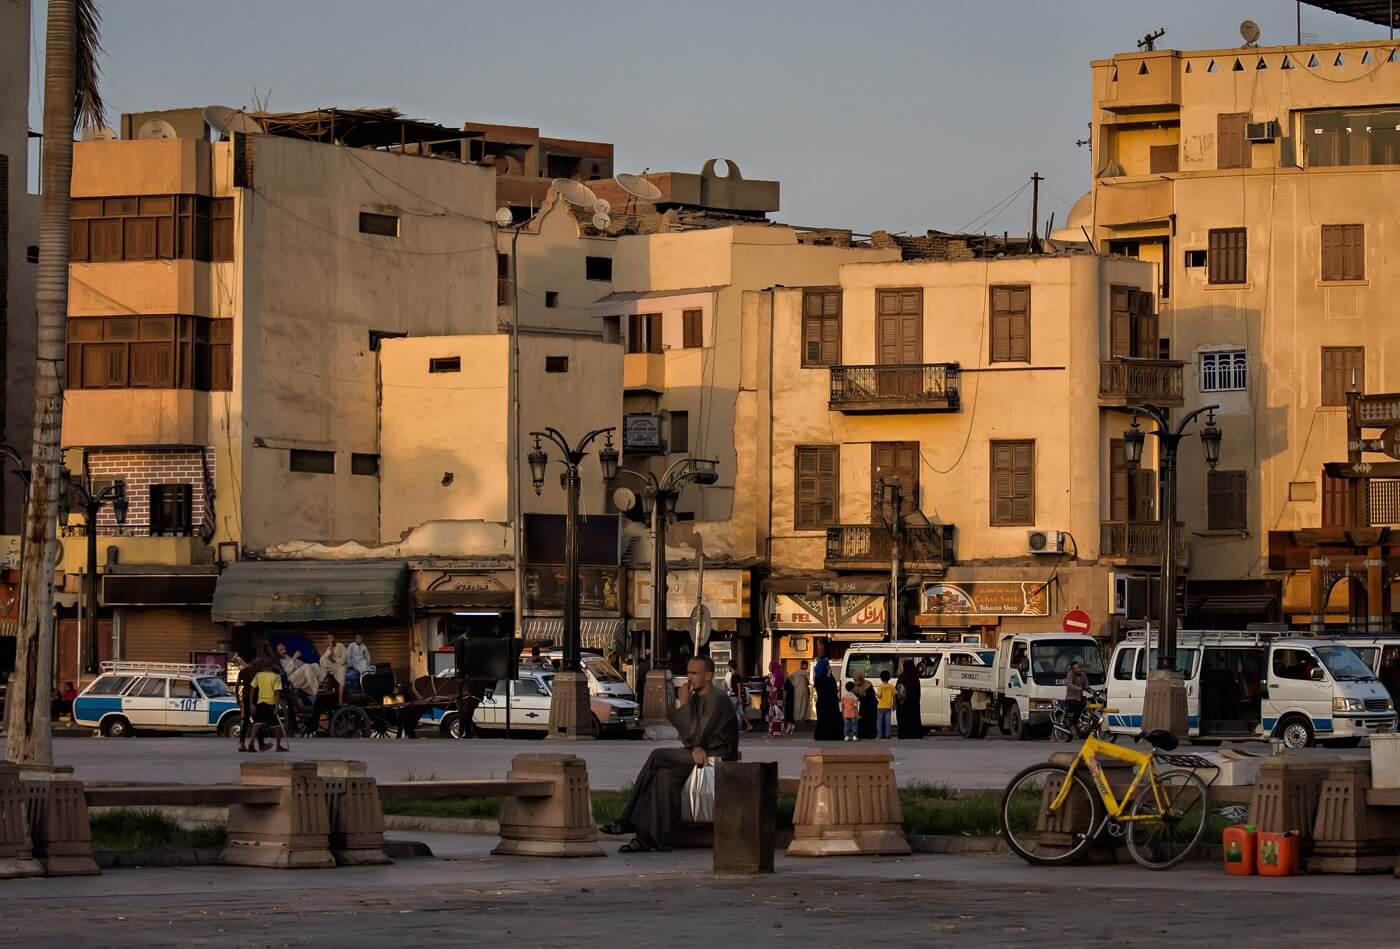 Main Square, Luxor, Egypt - Photo by Zed Sindelar of CuriousZed Photography